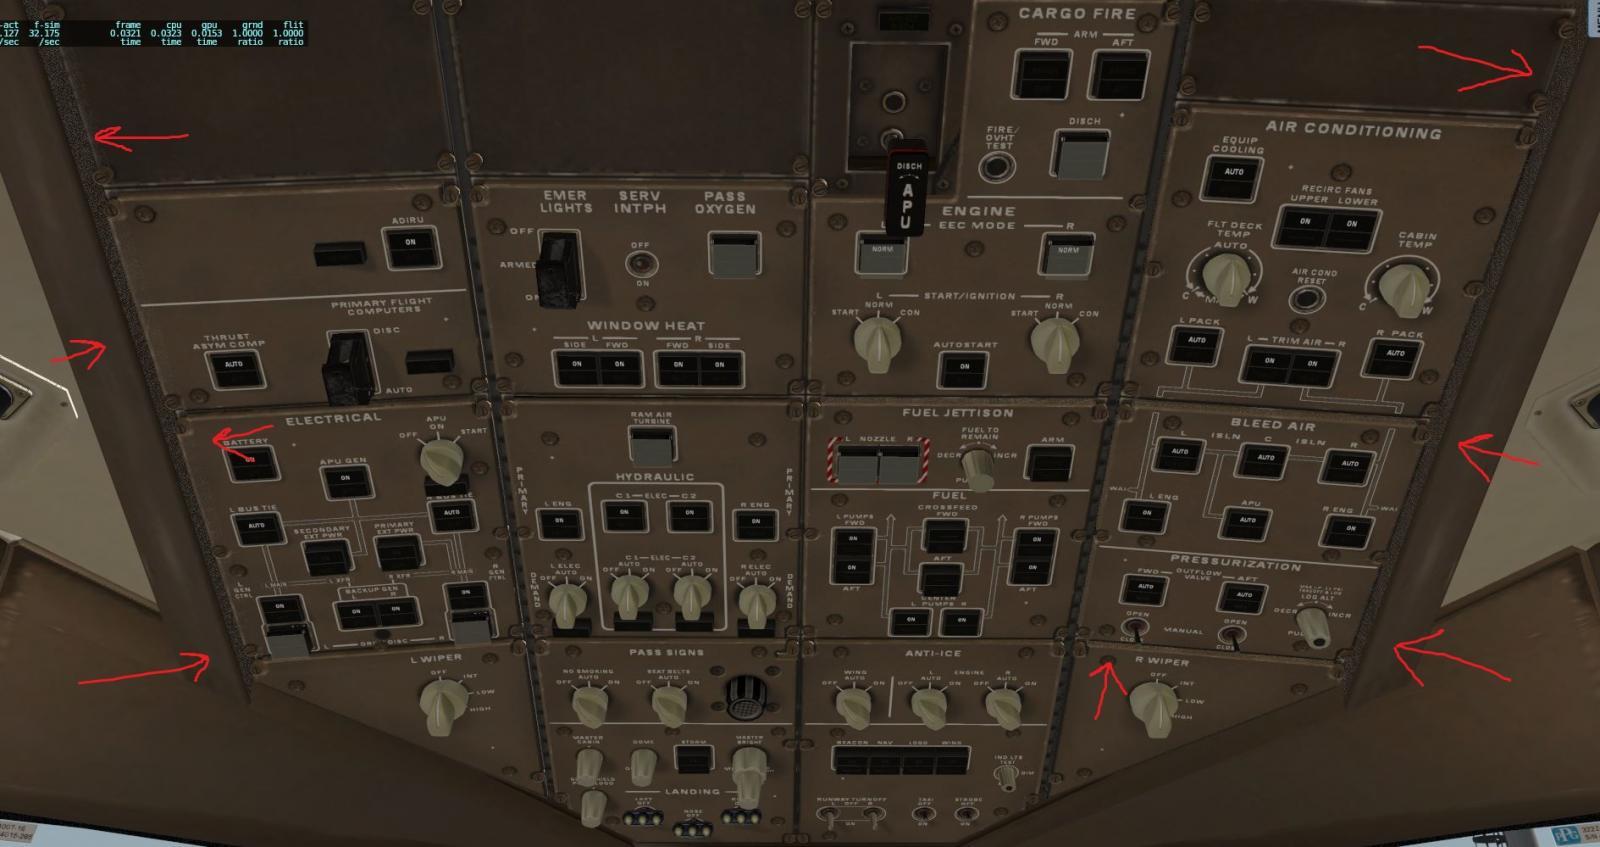 flickering problem with Boeing 777 Worldliner Professional - XP11